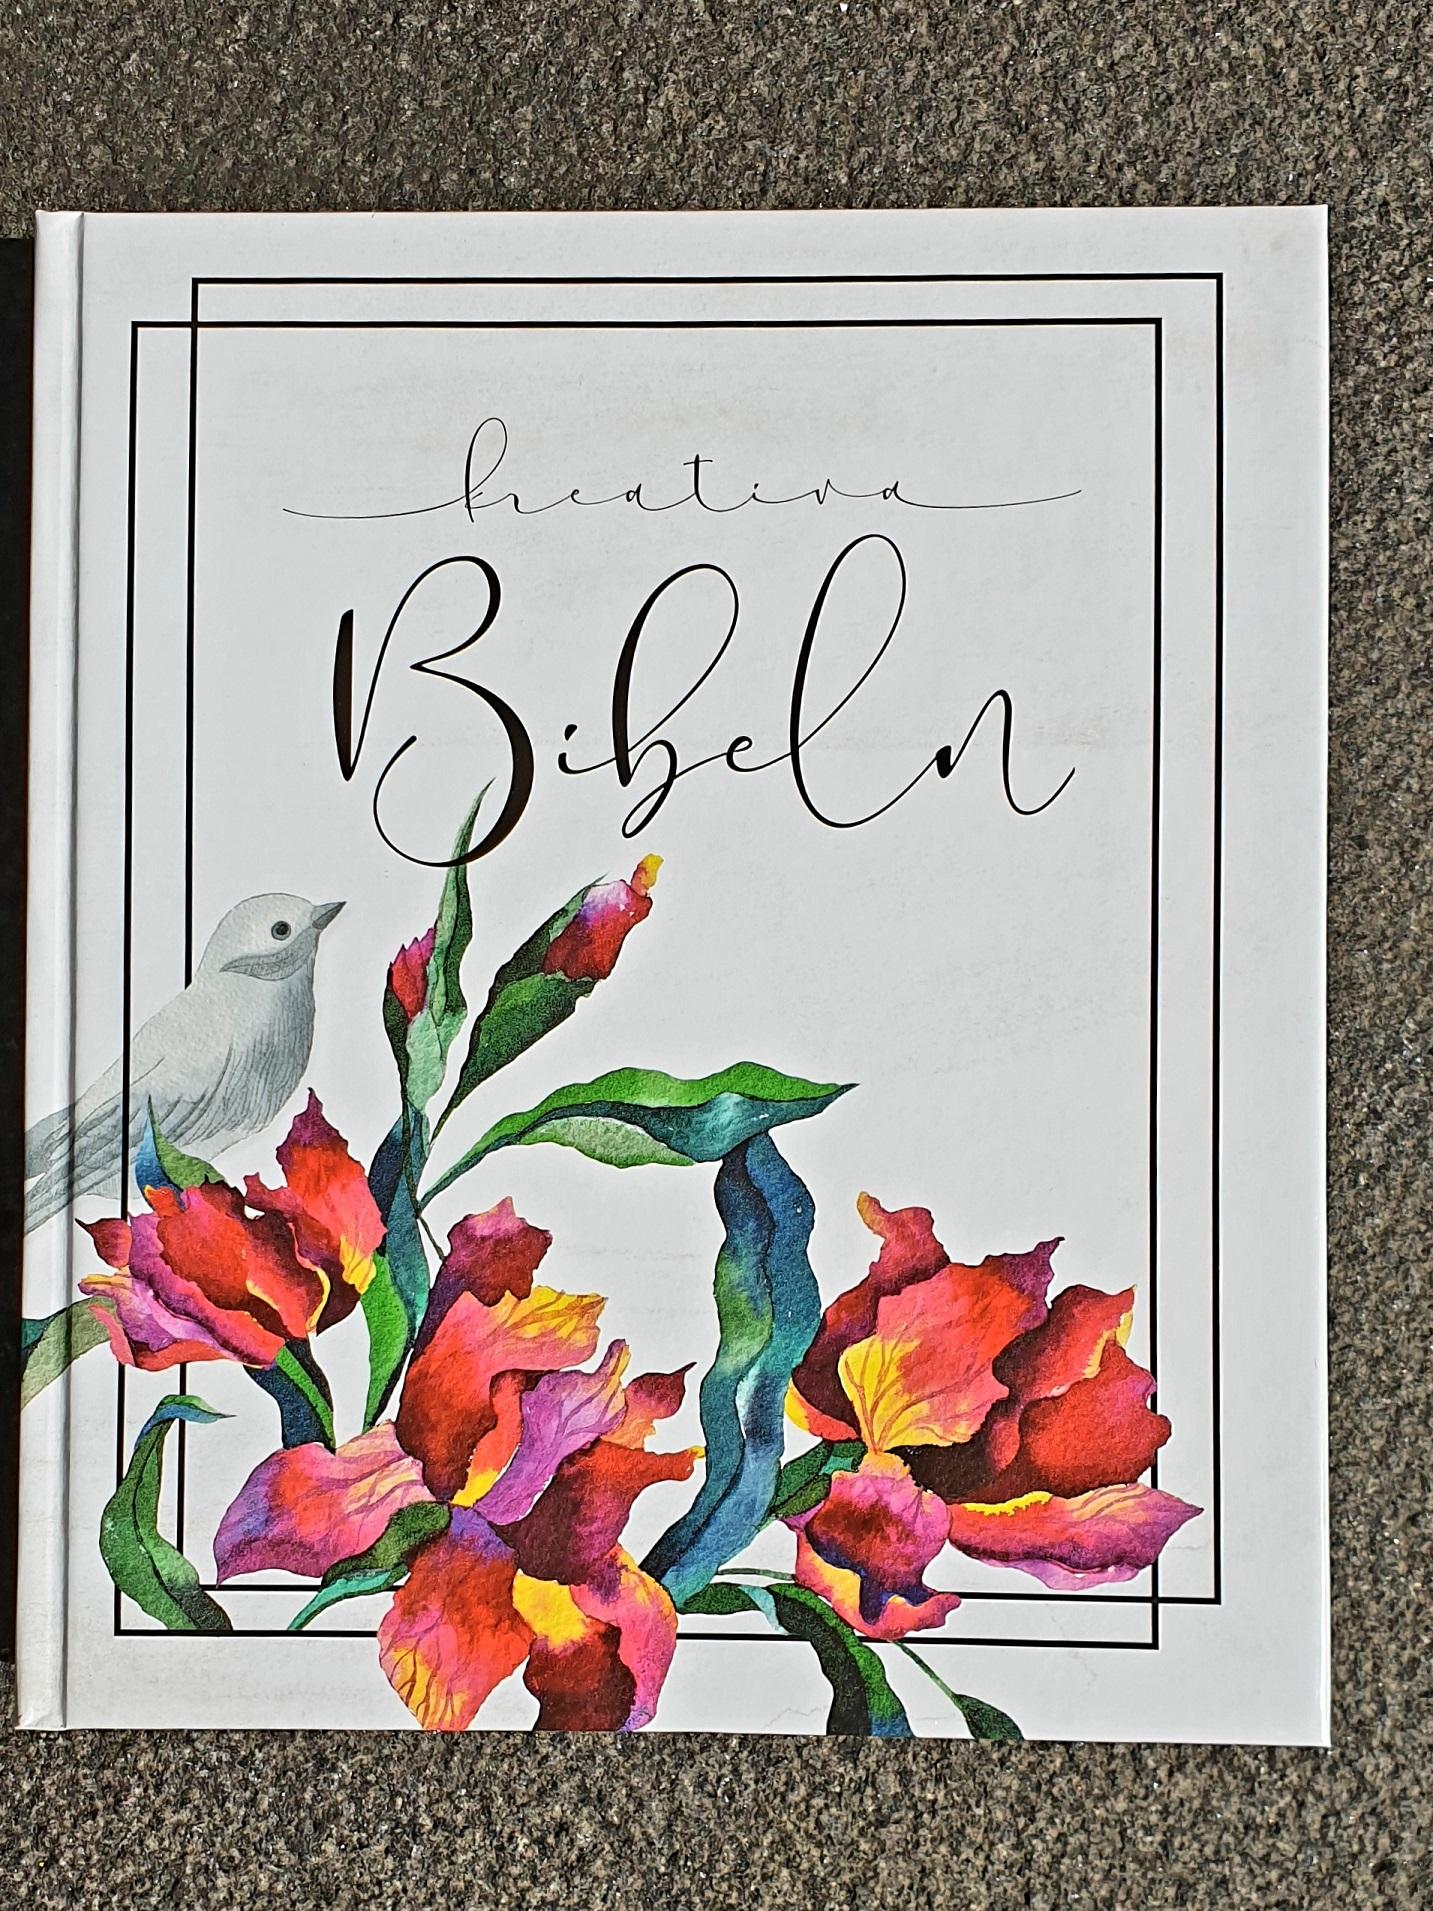 artikelnummer 2539 kreativ bibel vit via bibelbutiken.se